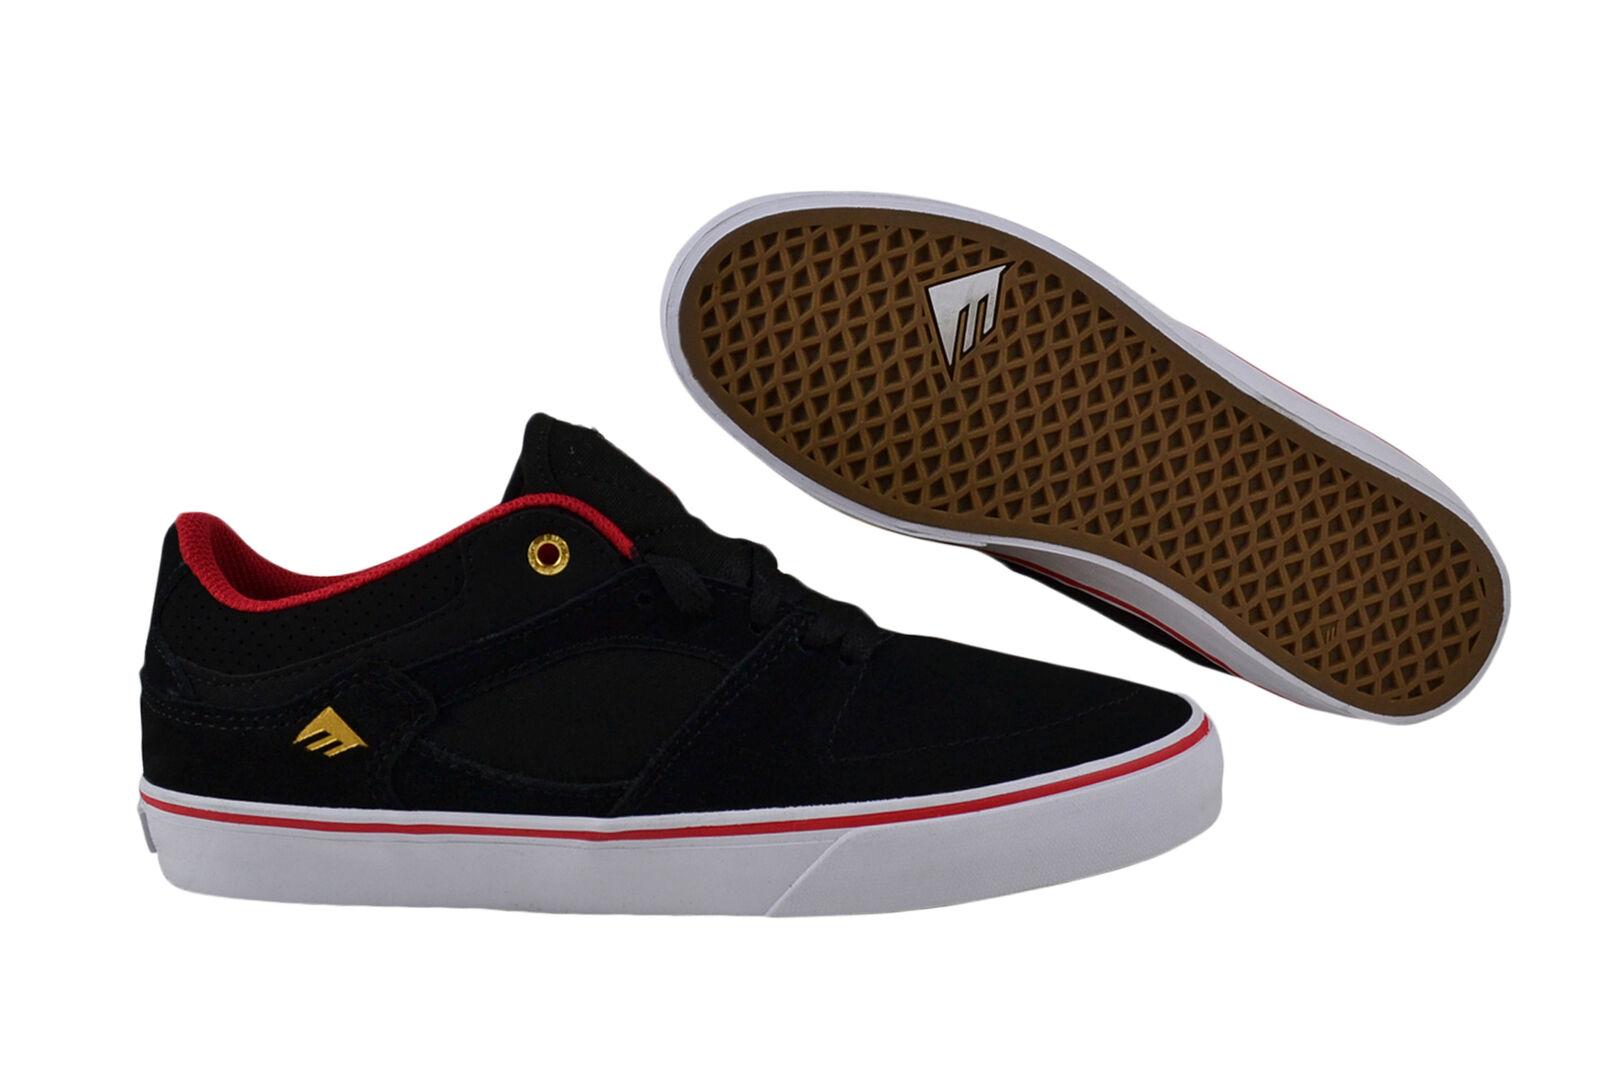 Emerica The HSU Low x Chocolate Black/Red/White Black/Red/White Black/Red/White Baskets/Chaussures | Bradées  96cc9f